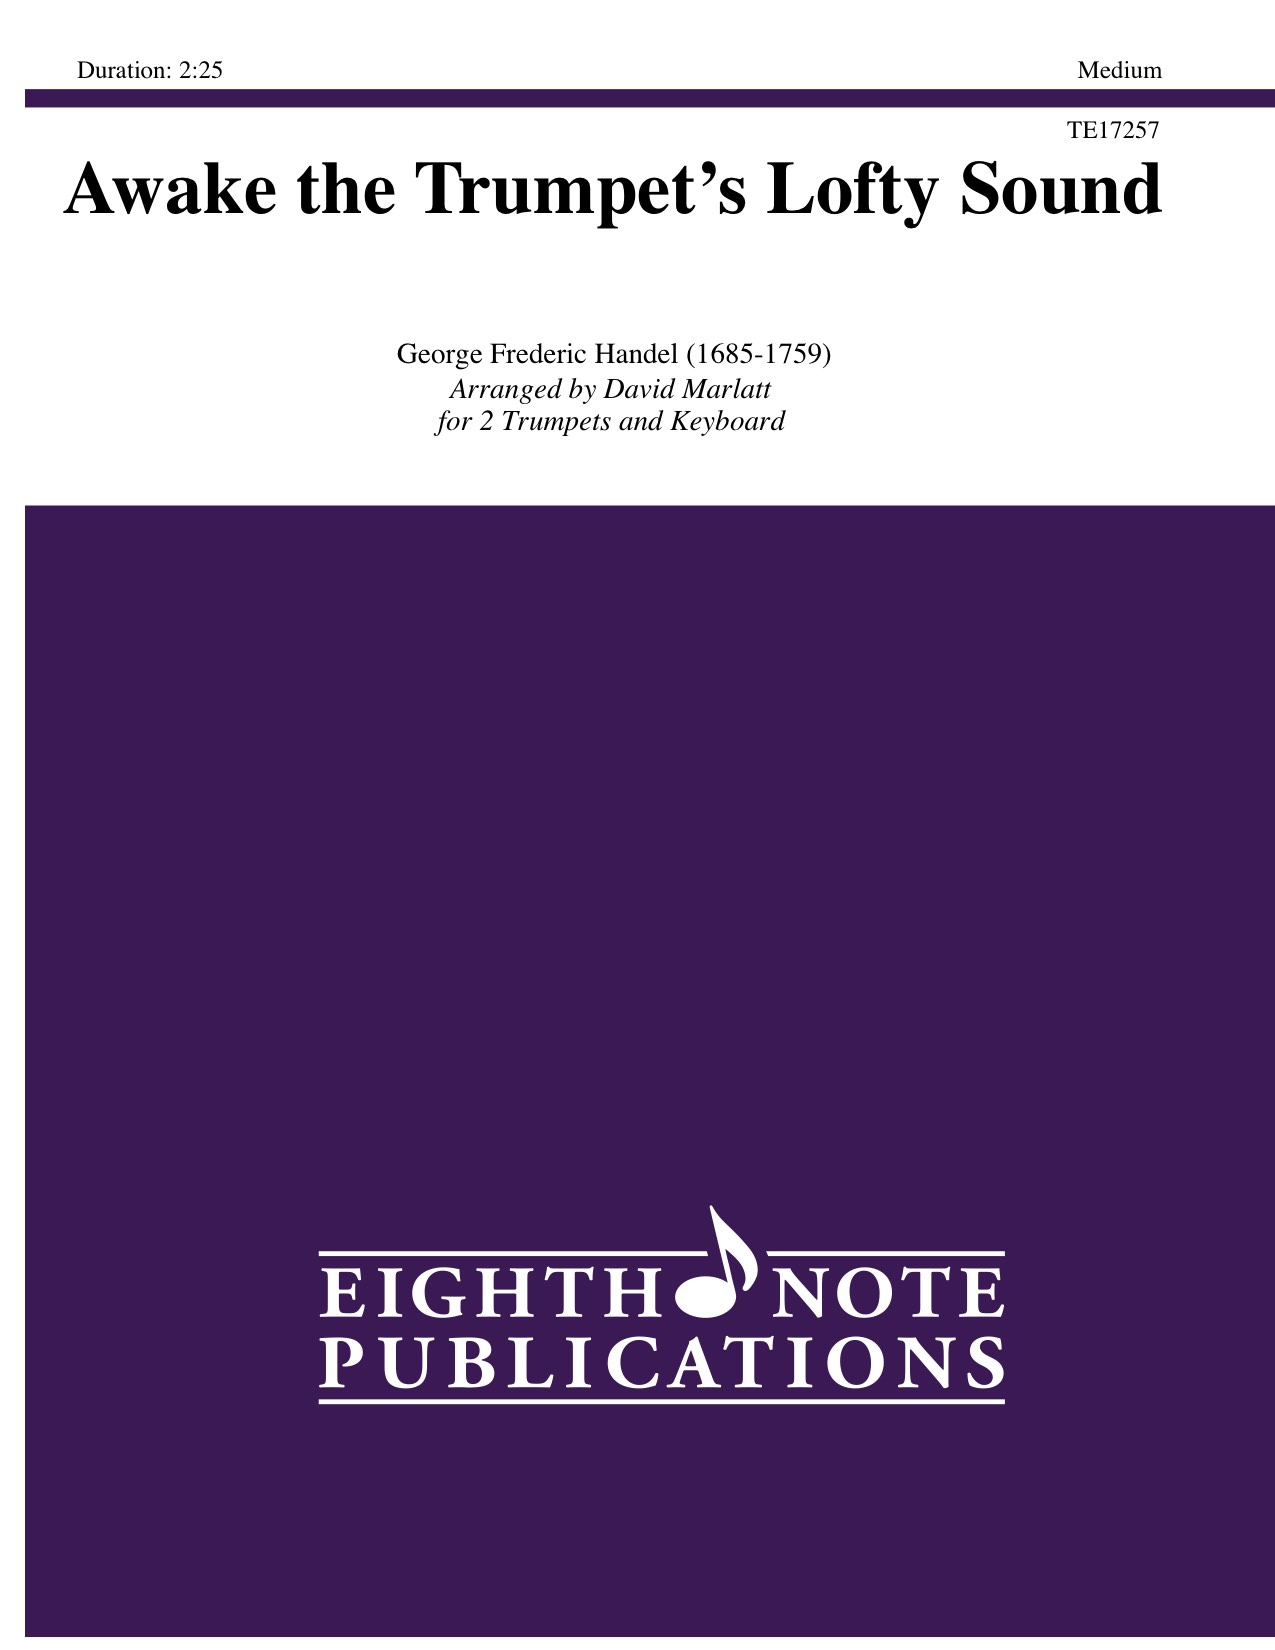 Awake the Trumpets Lofty Sound - George Frederic Handel